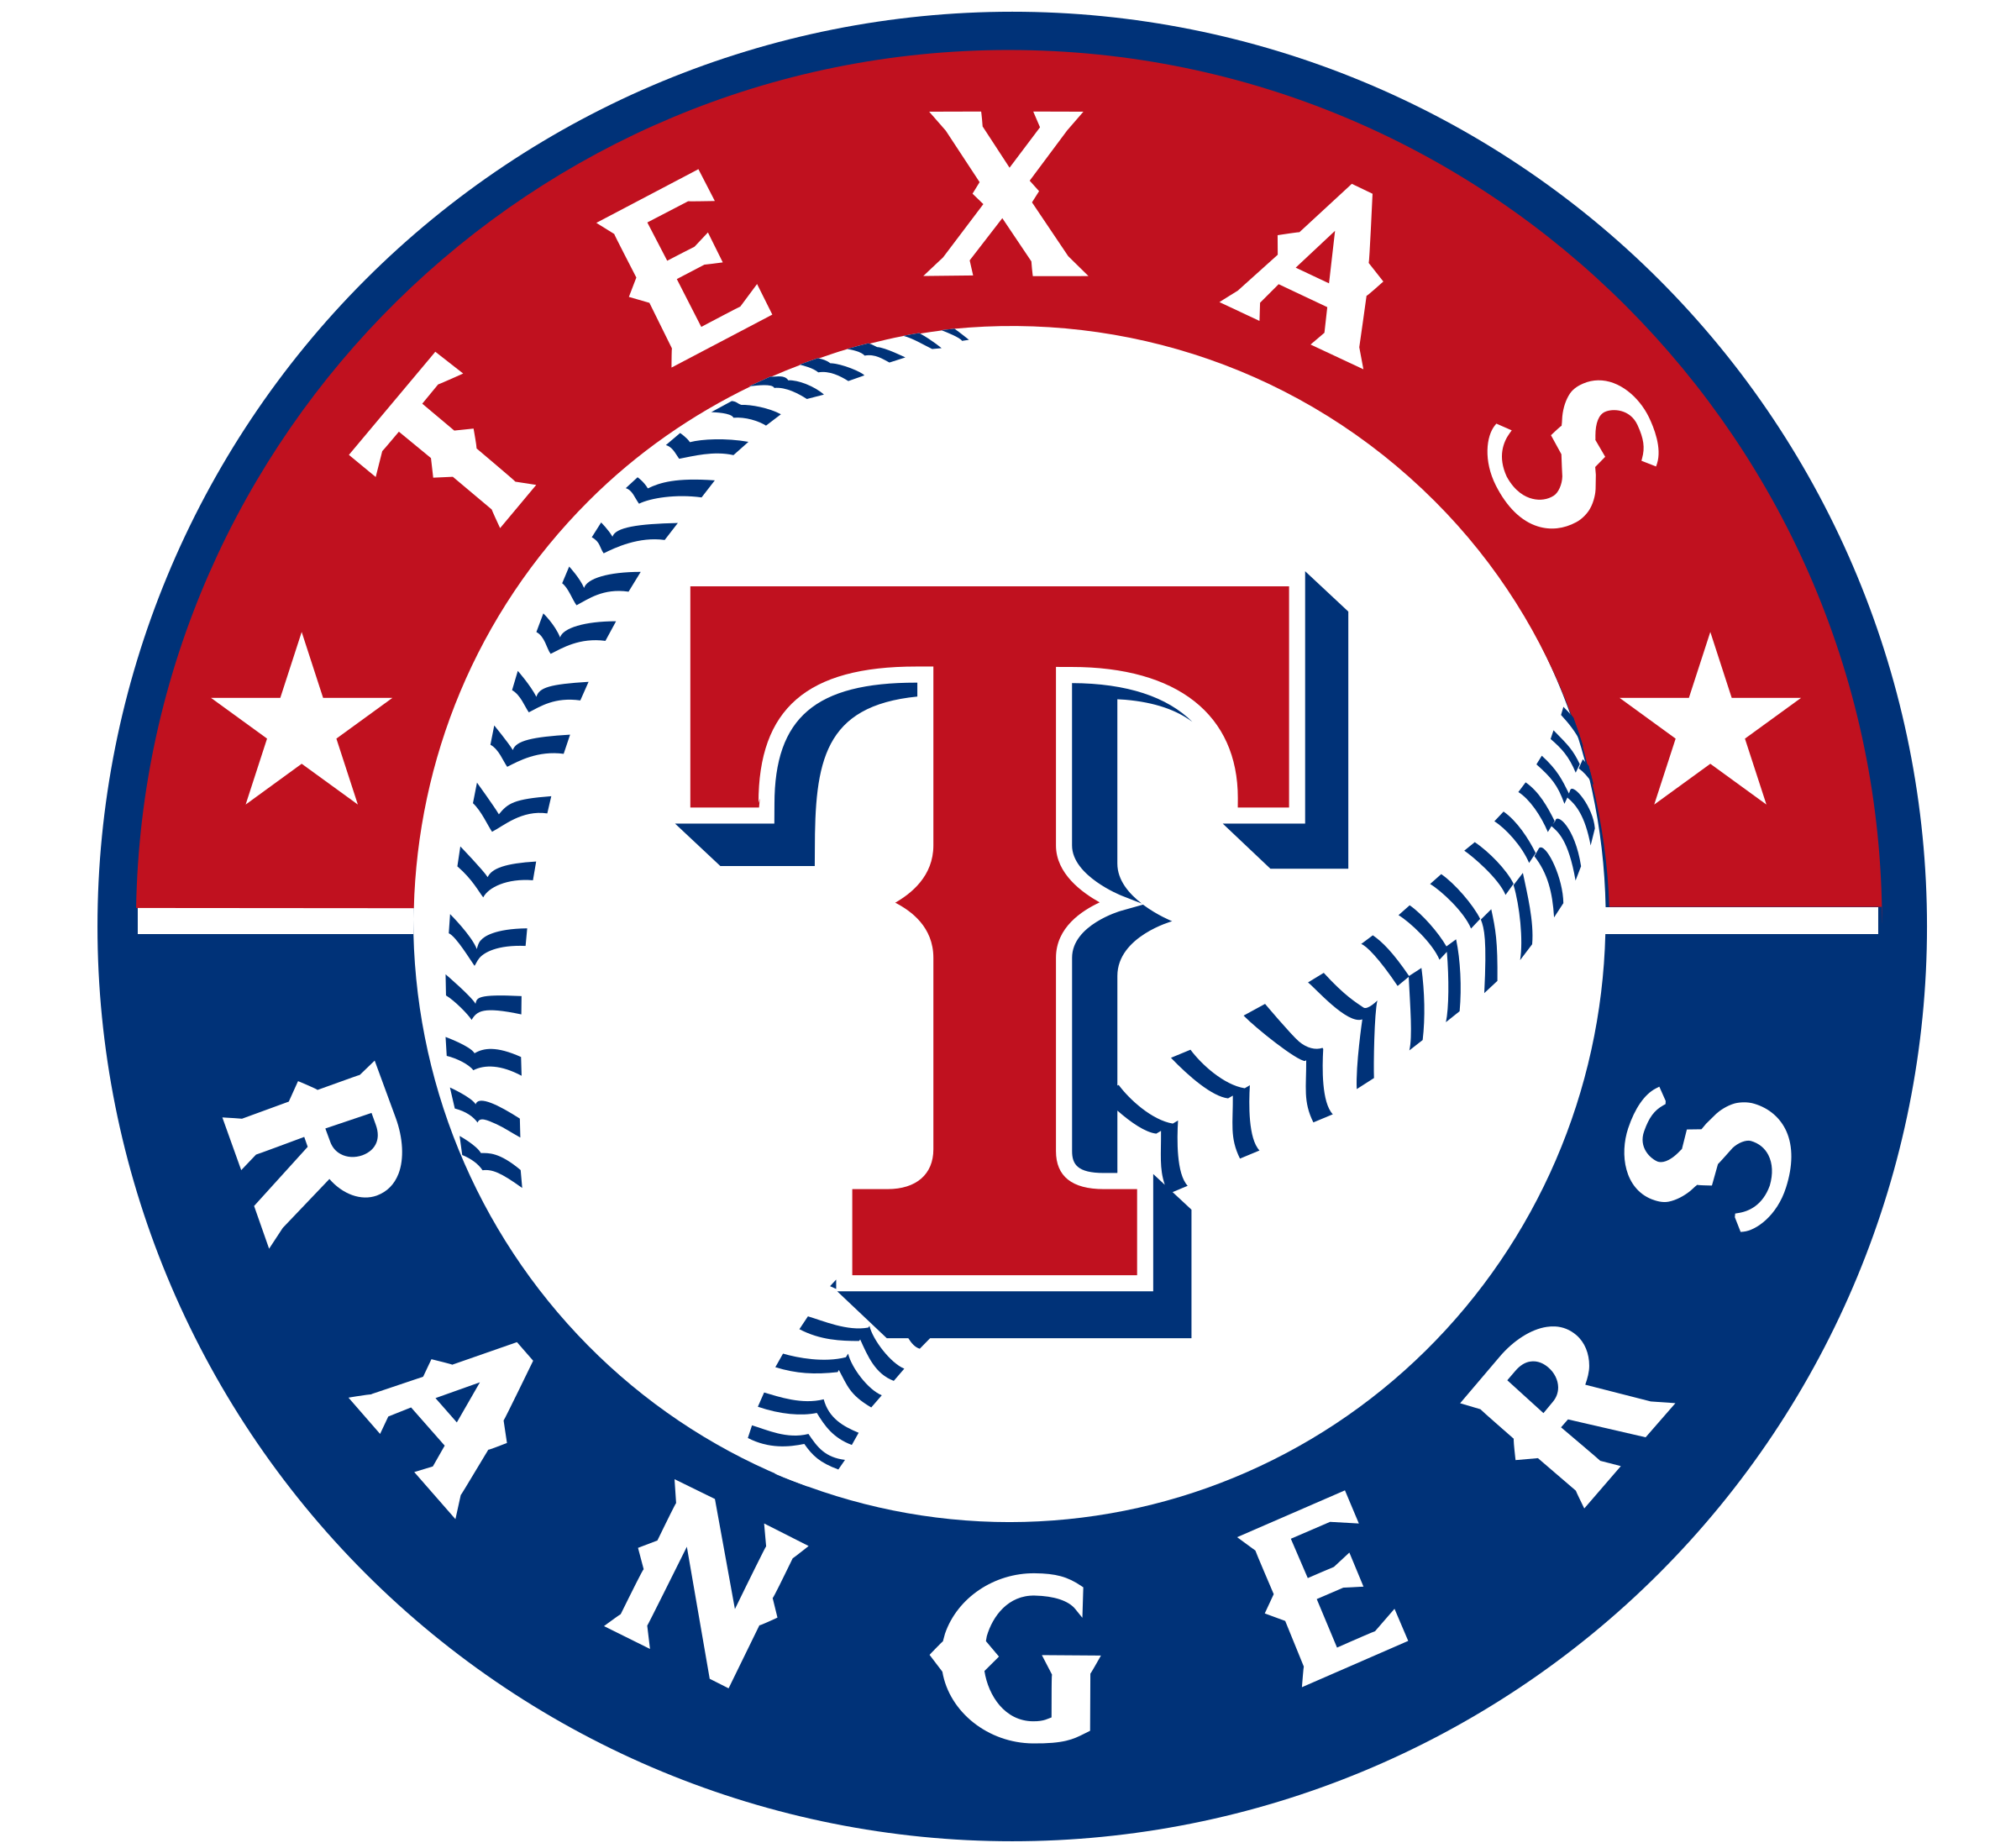 royalty free stock Texas logo png transparent. Svg baseball rangers